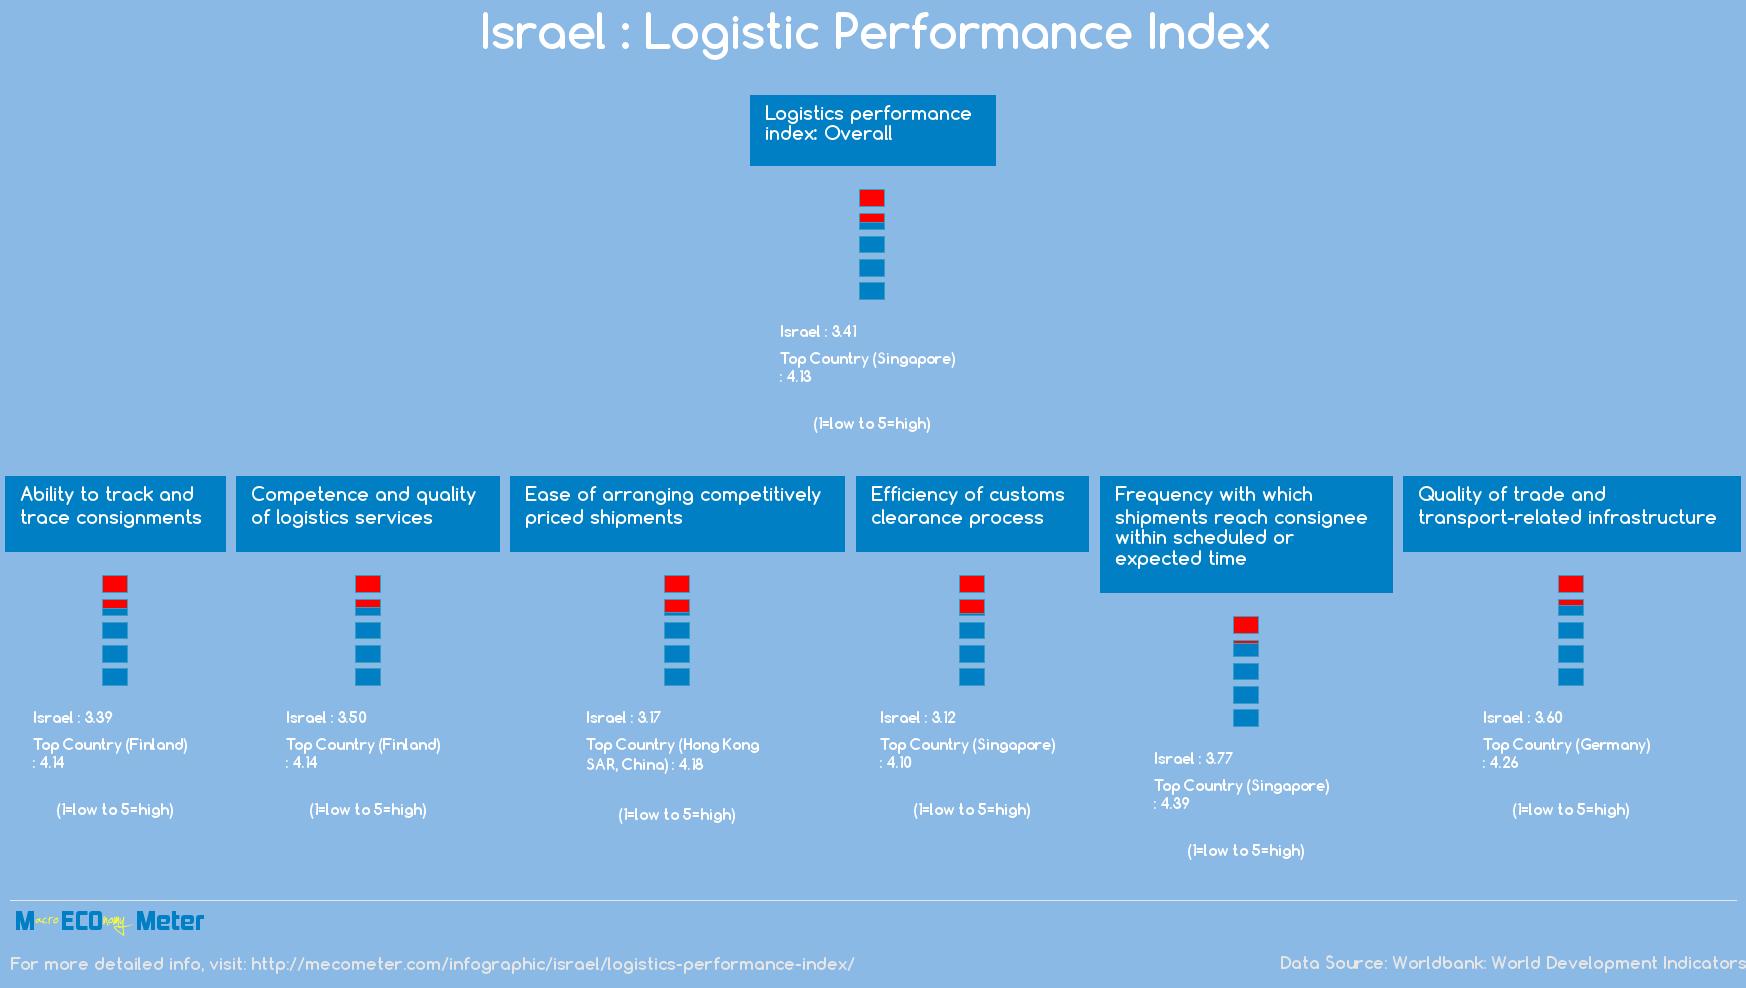 Israel : Logistic Performance Index